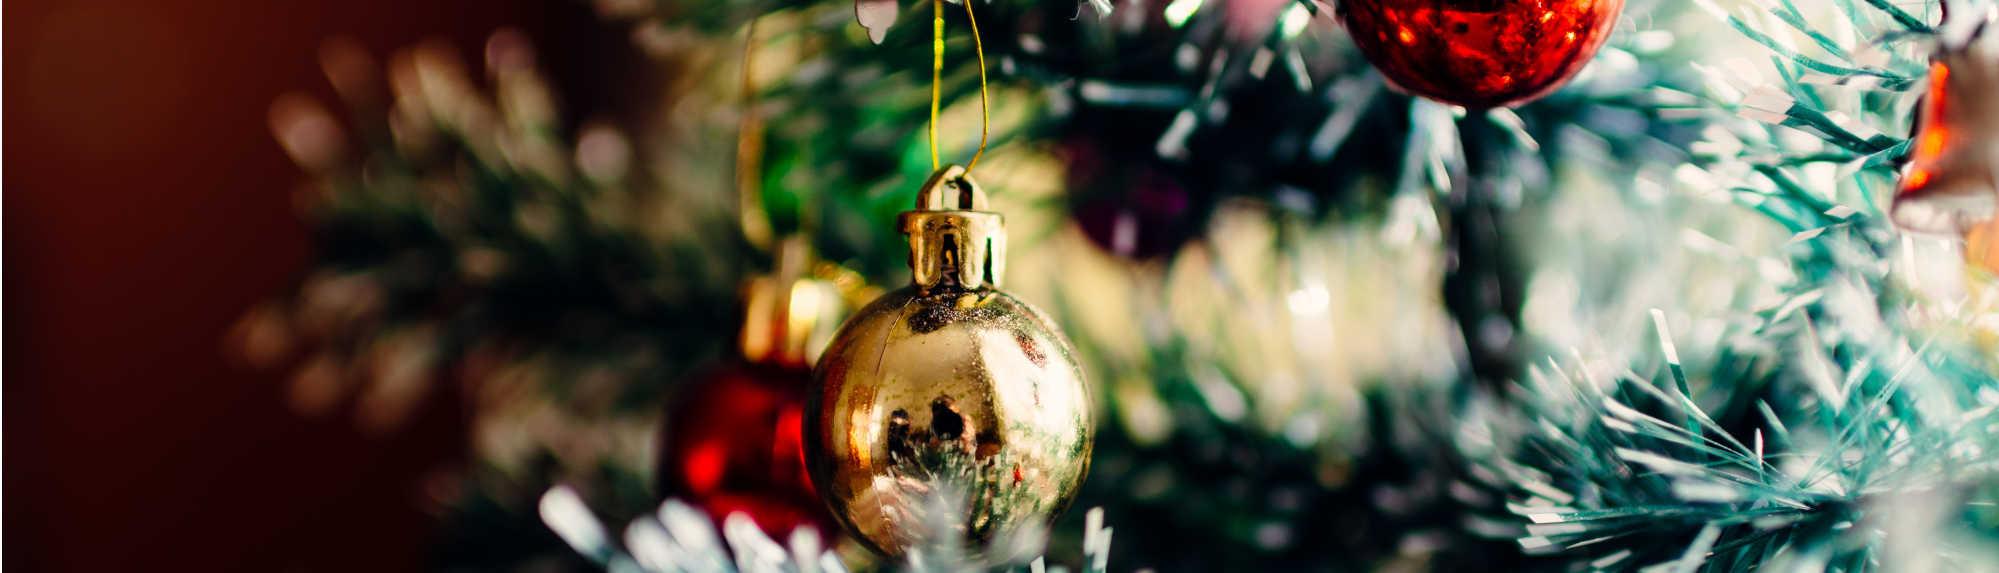 7 Australian Christmas Traditions that We Love